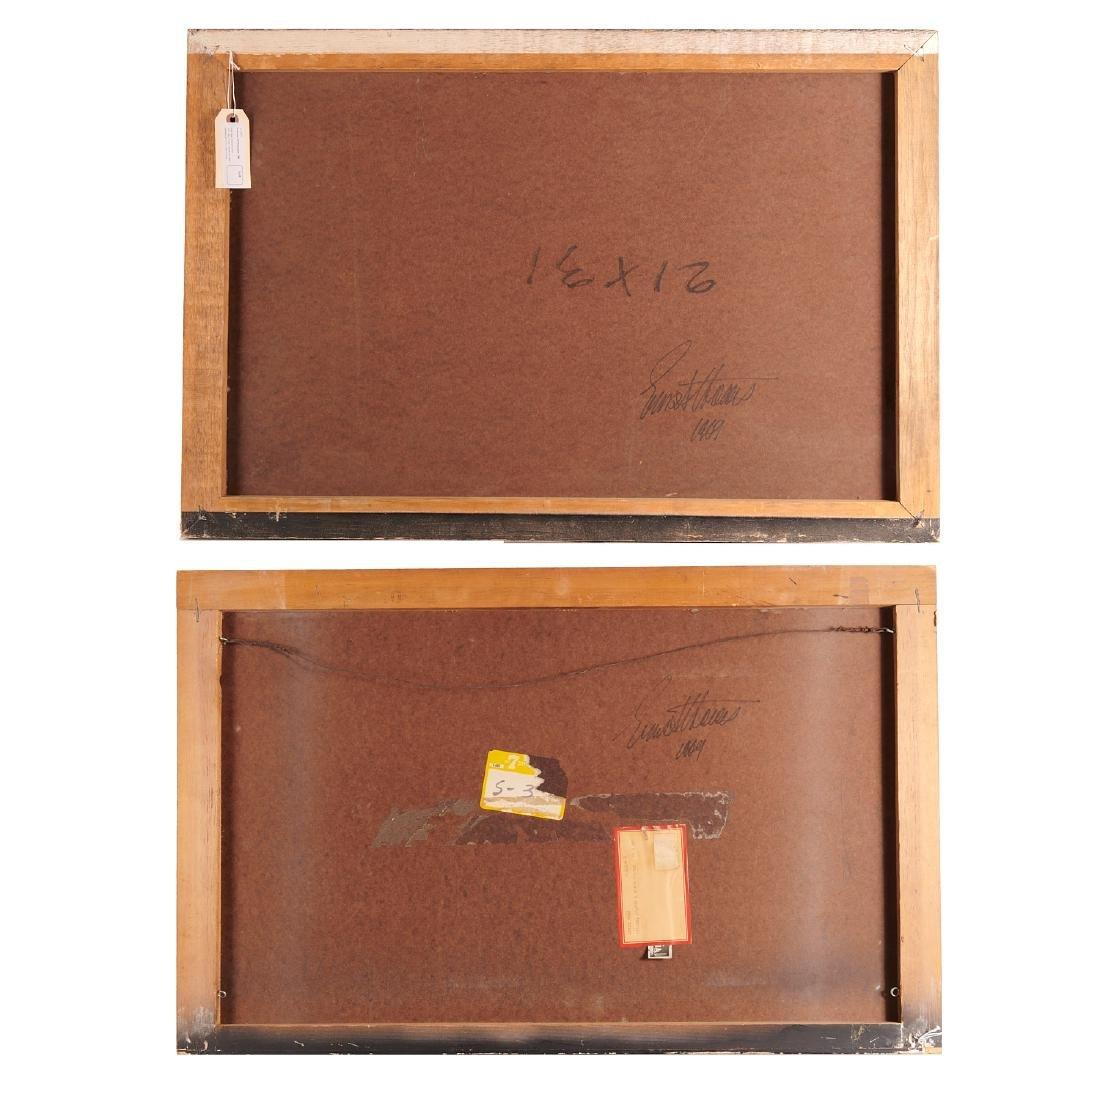 Ernst Haas, (2) Photographs, 1969 - 8